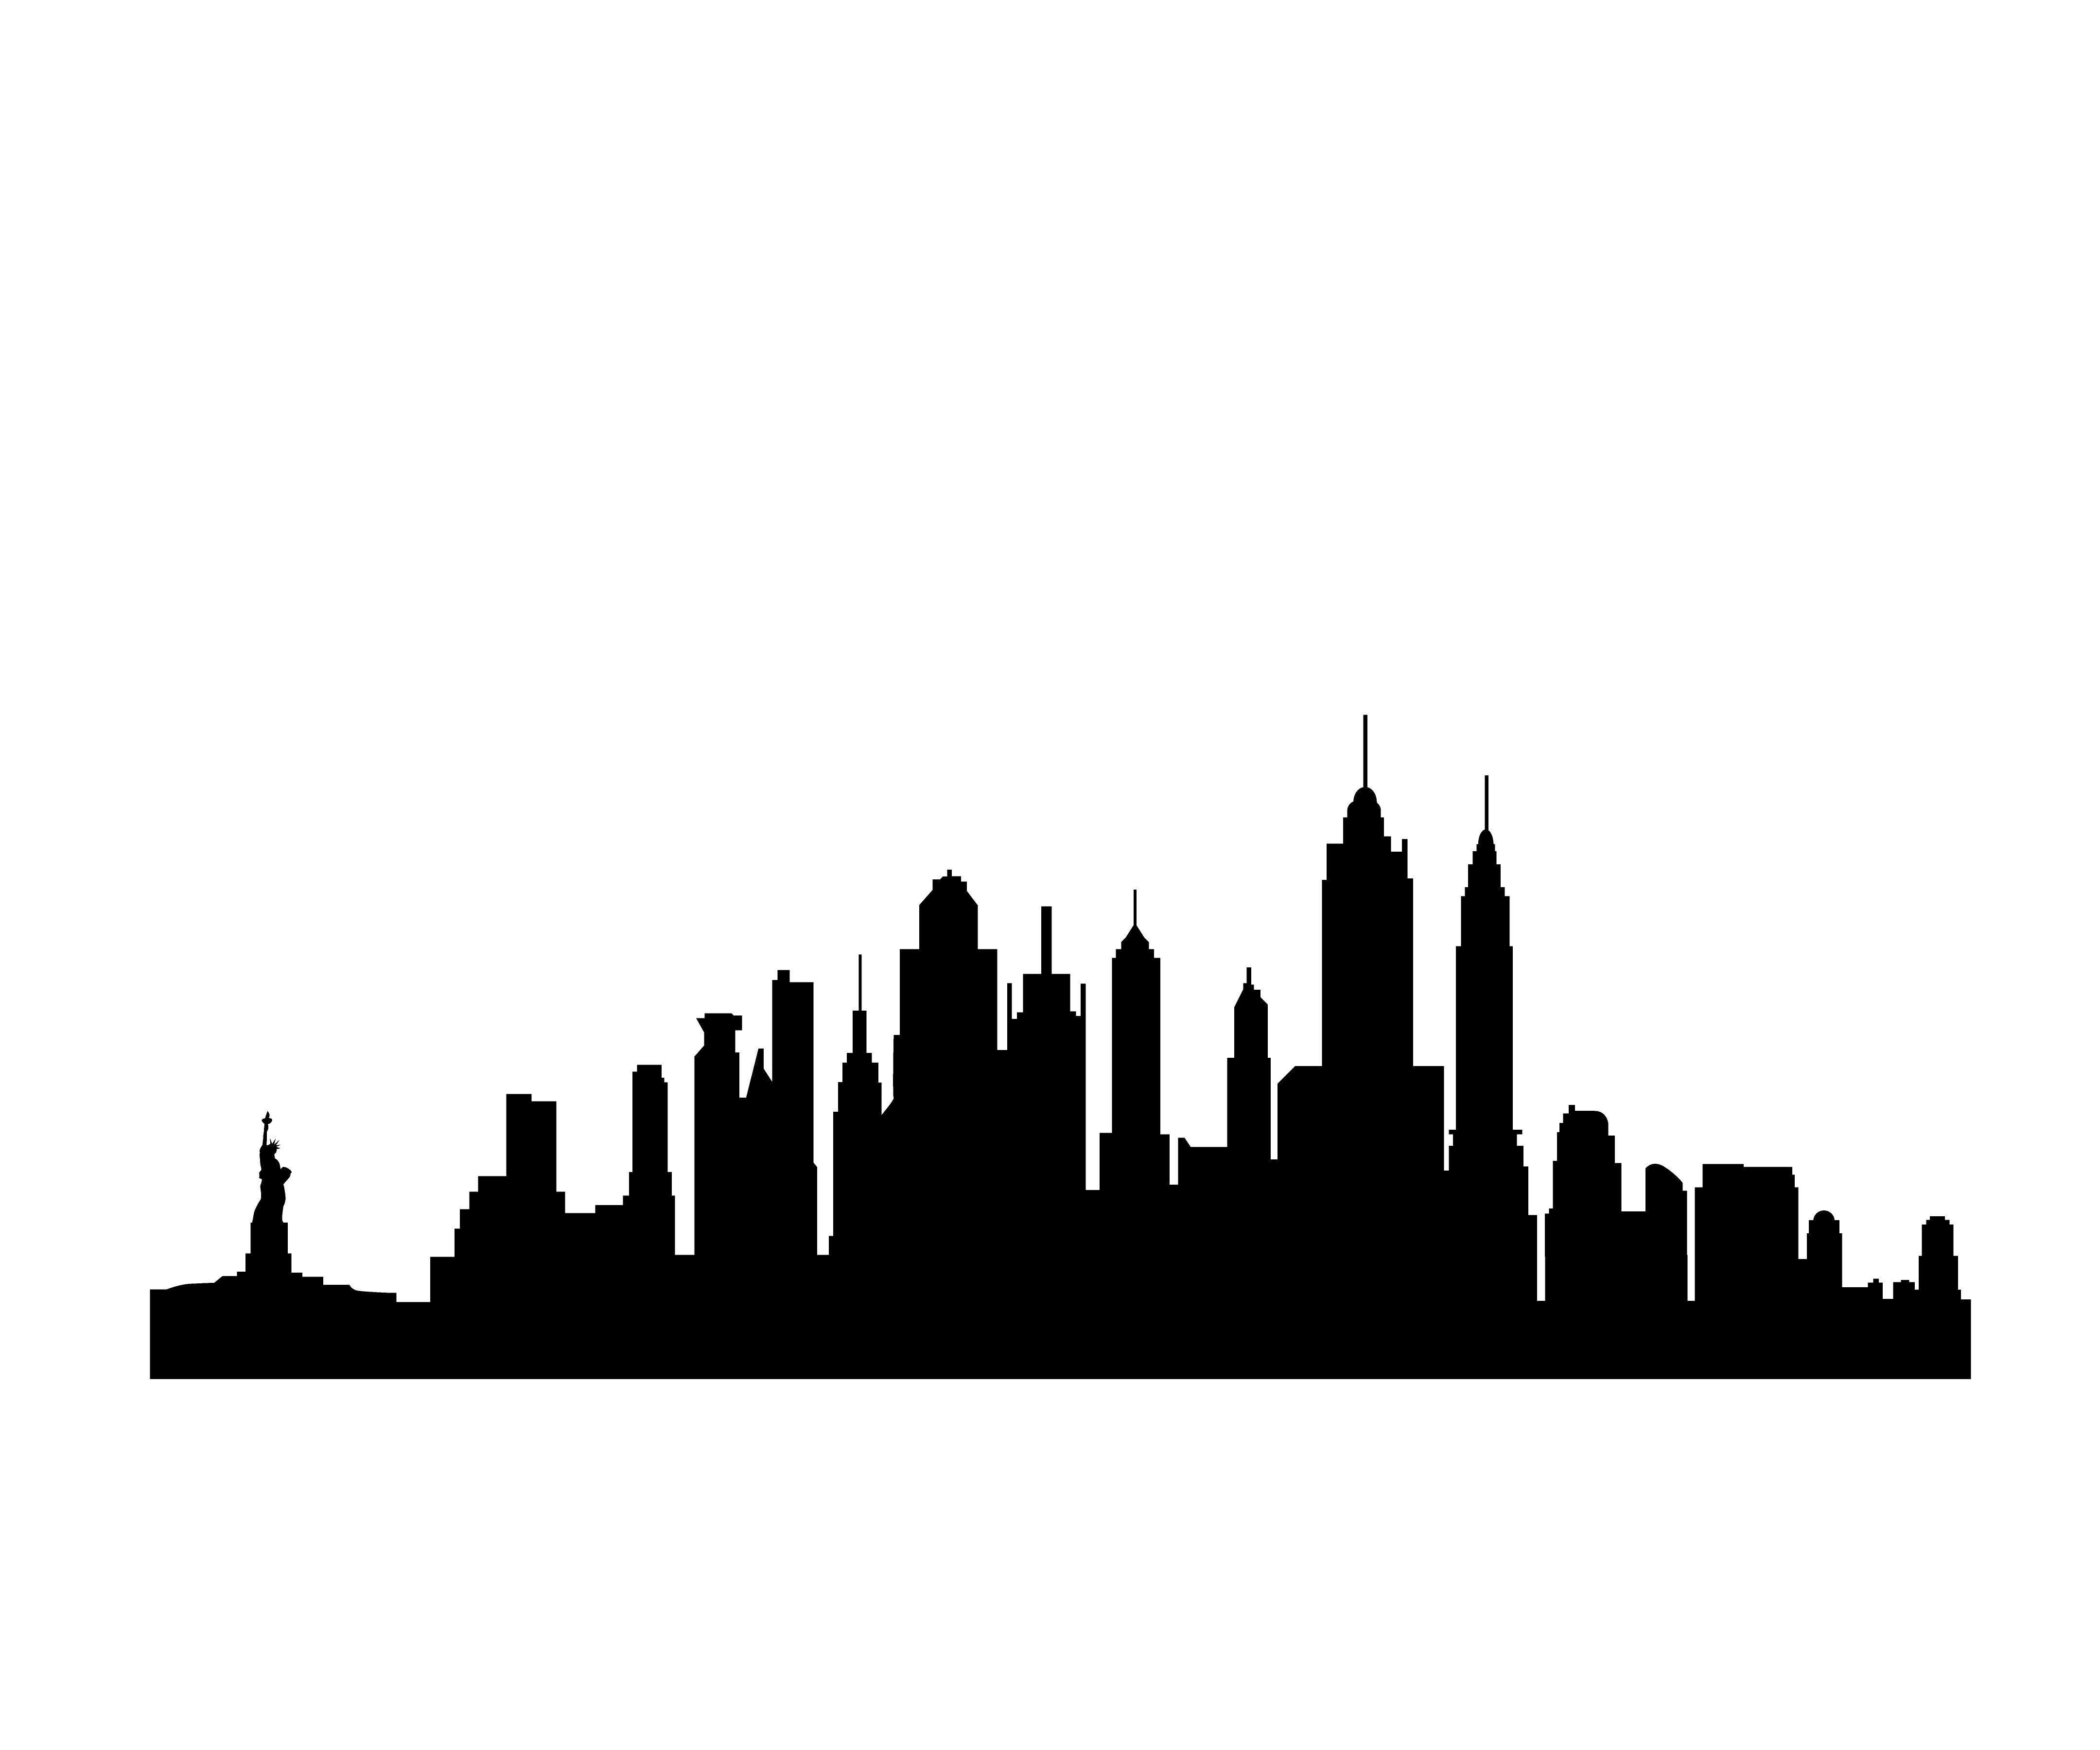 Skyline New York Posters Unkreatives Allposters Com In 2020 New York Skyline Silhouette Skyline Drawing Skyline Silhouette